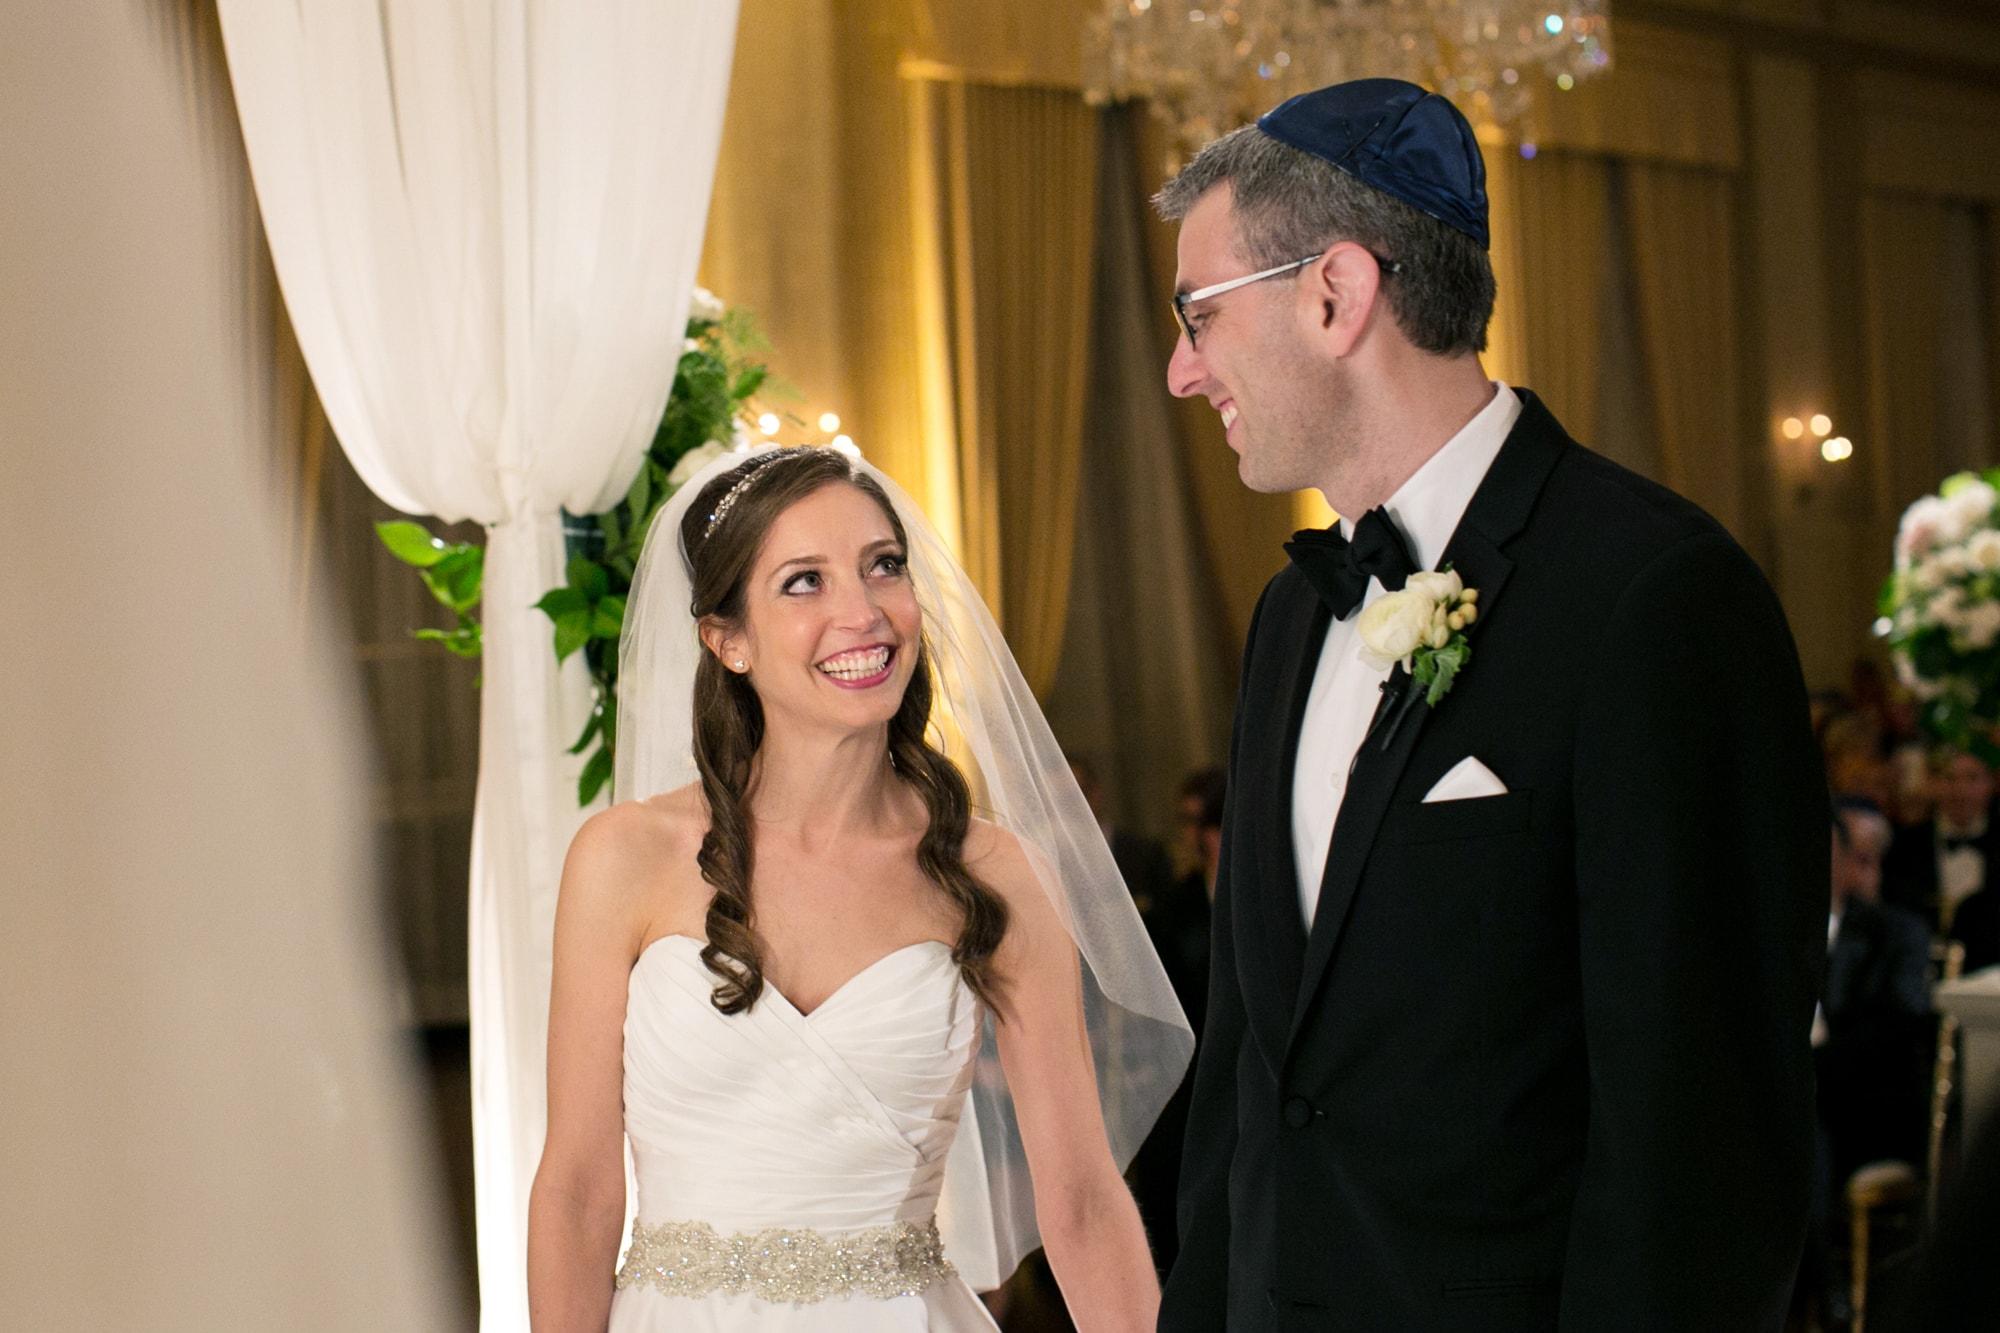 Bride and groom exchange vows under huppa at wedding ceremony